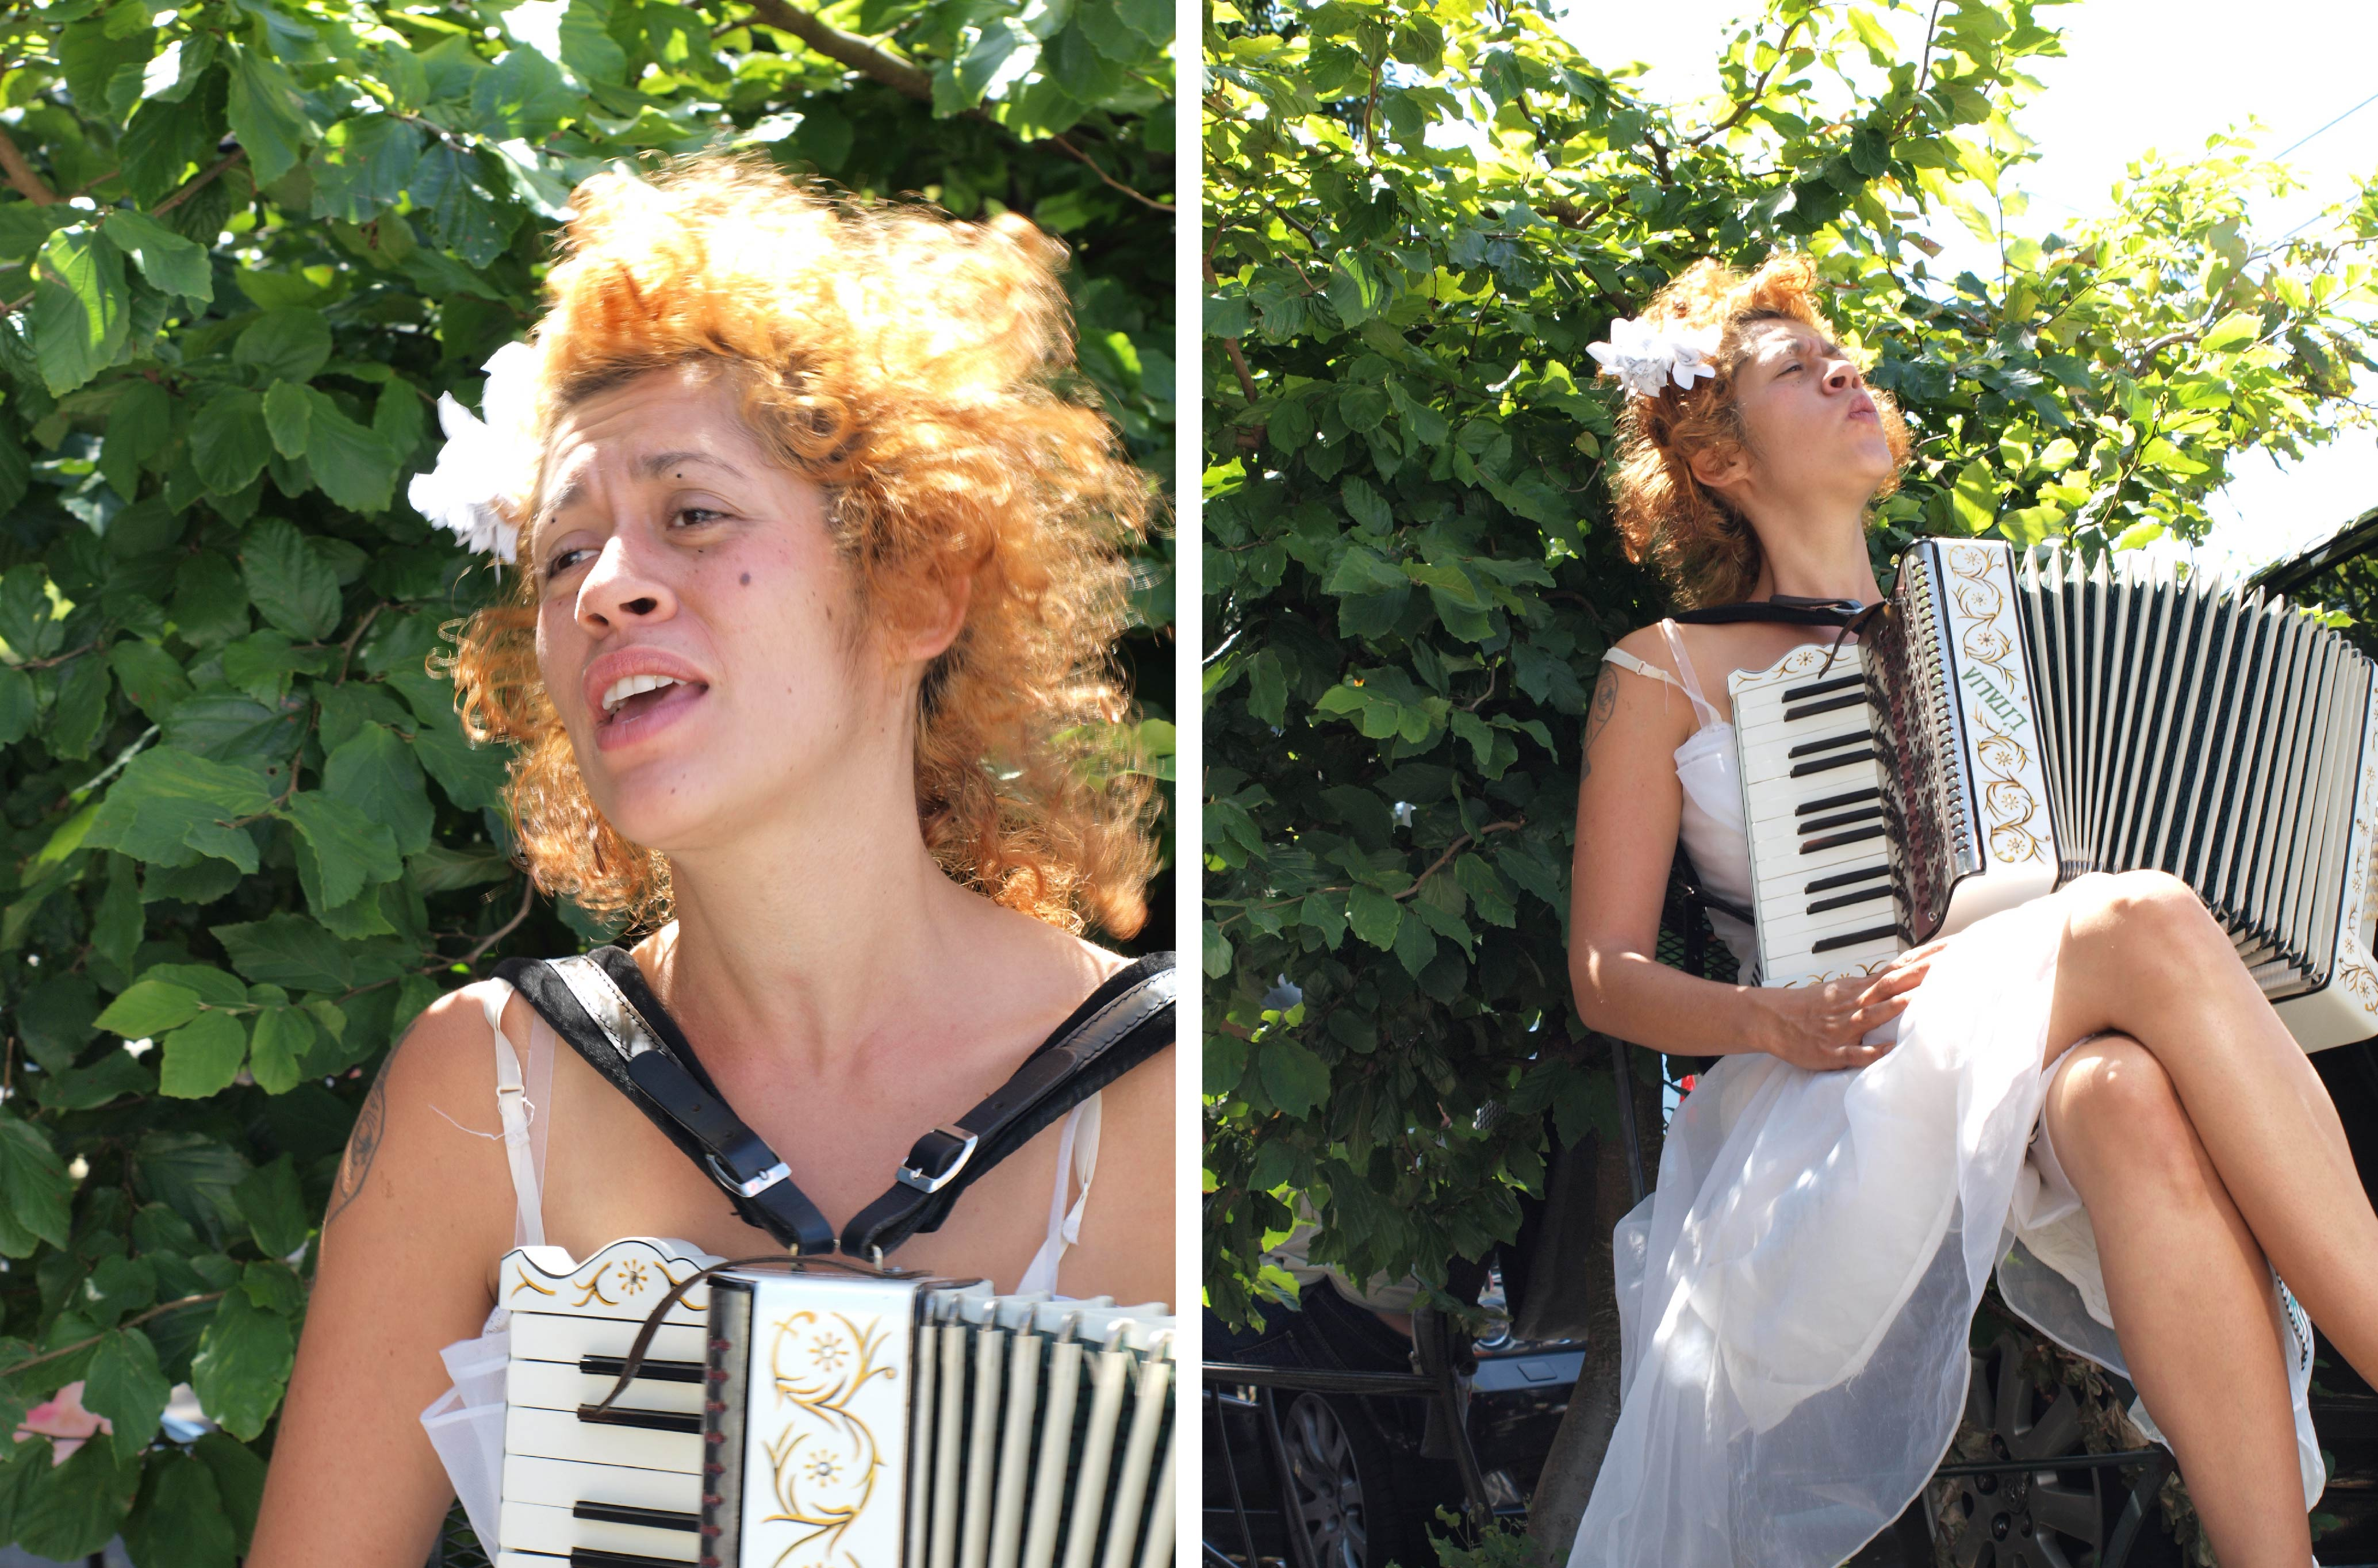 portland writer, beverage writer, portland music, street musician